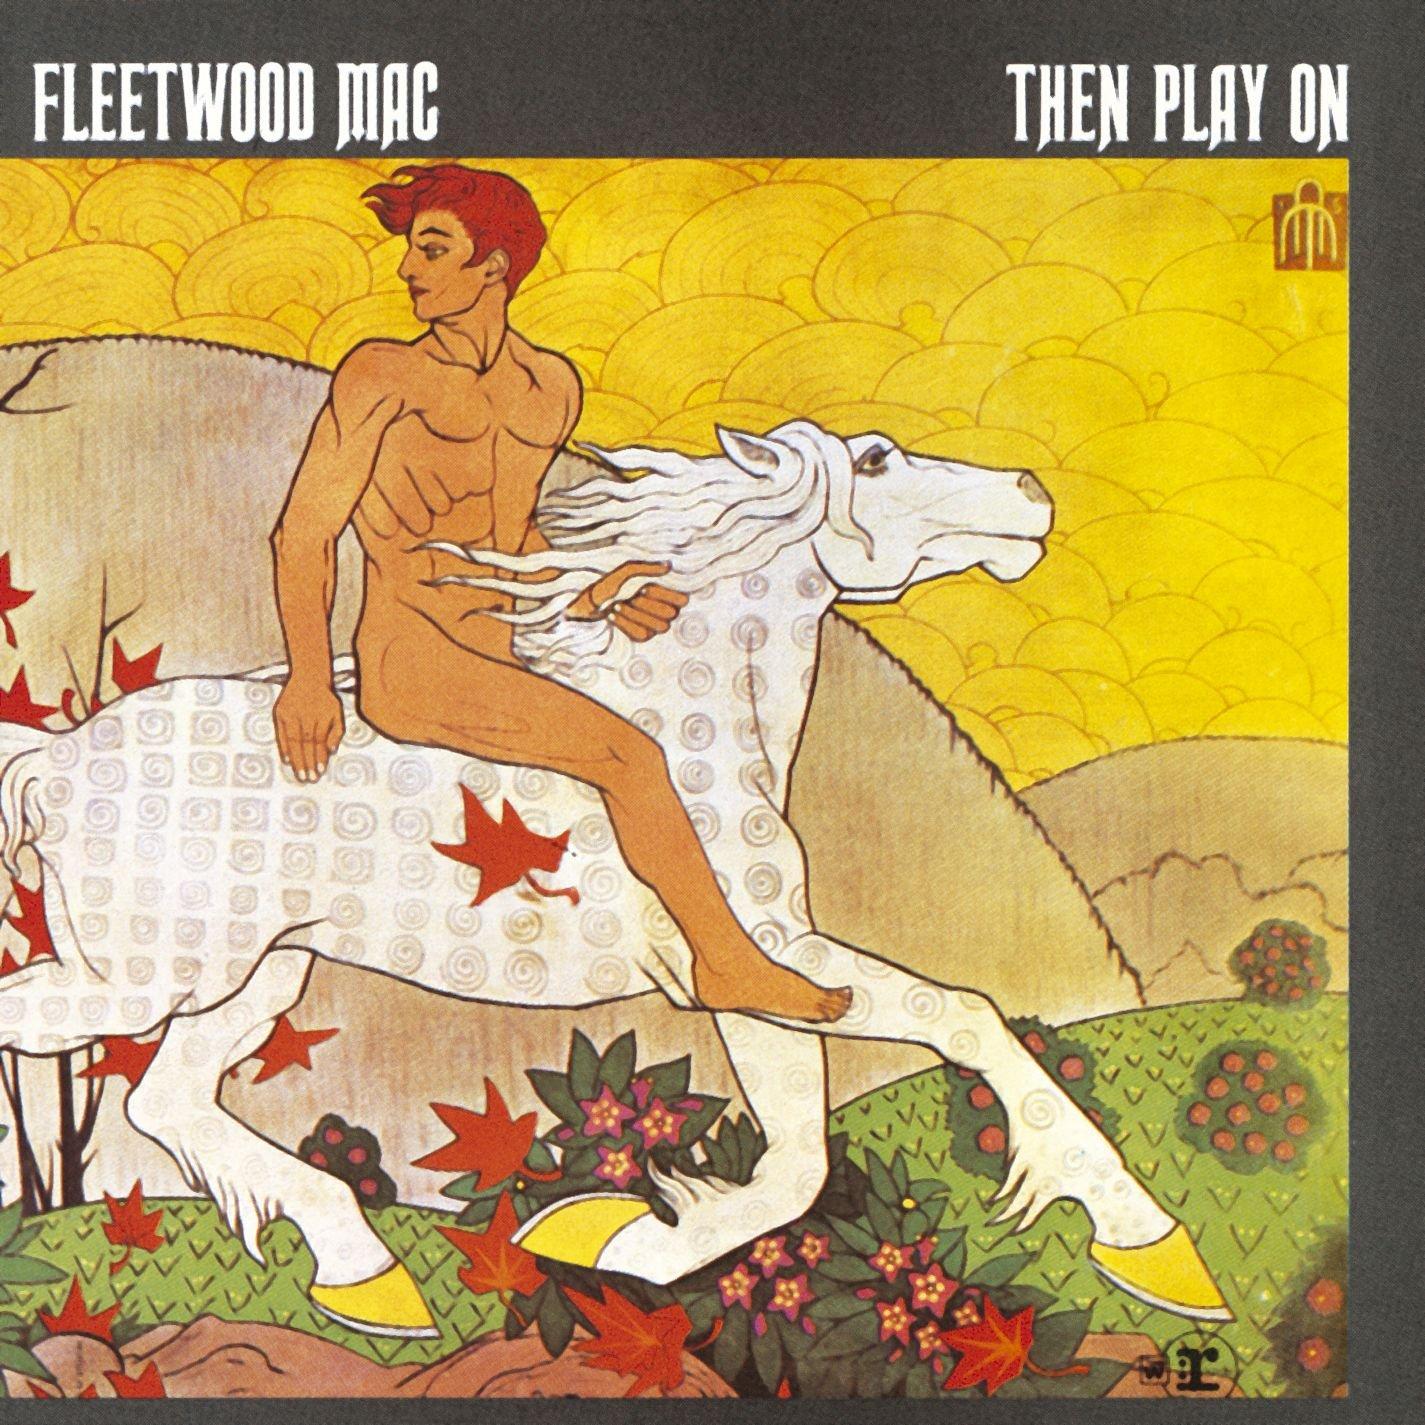 Fleetwood Mac - Then Play On - Amazon.com Music